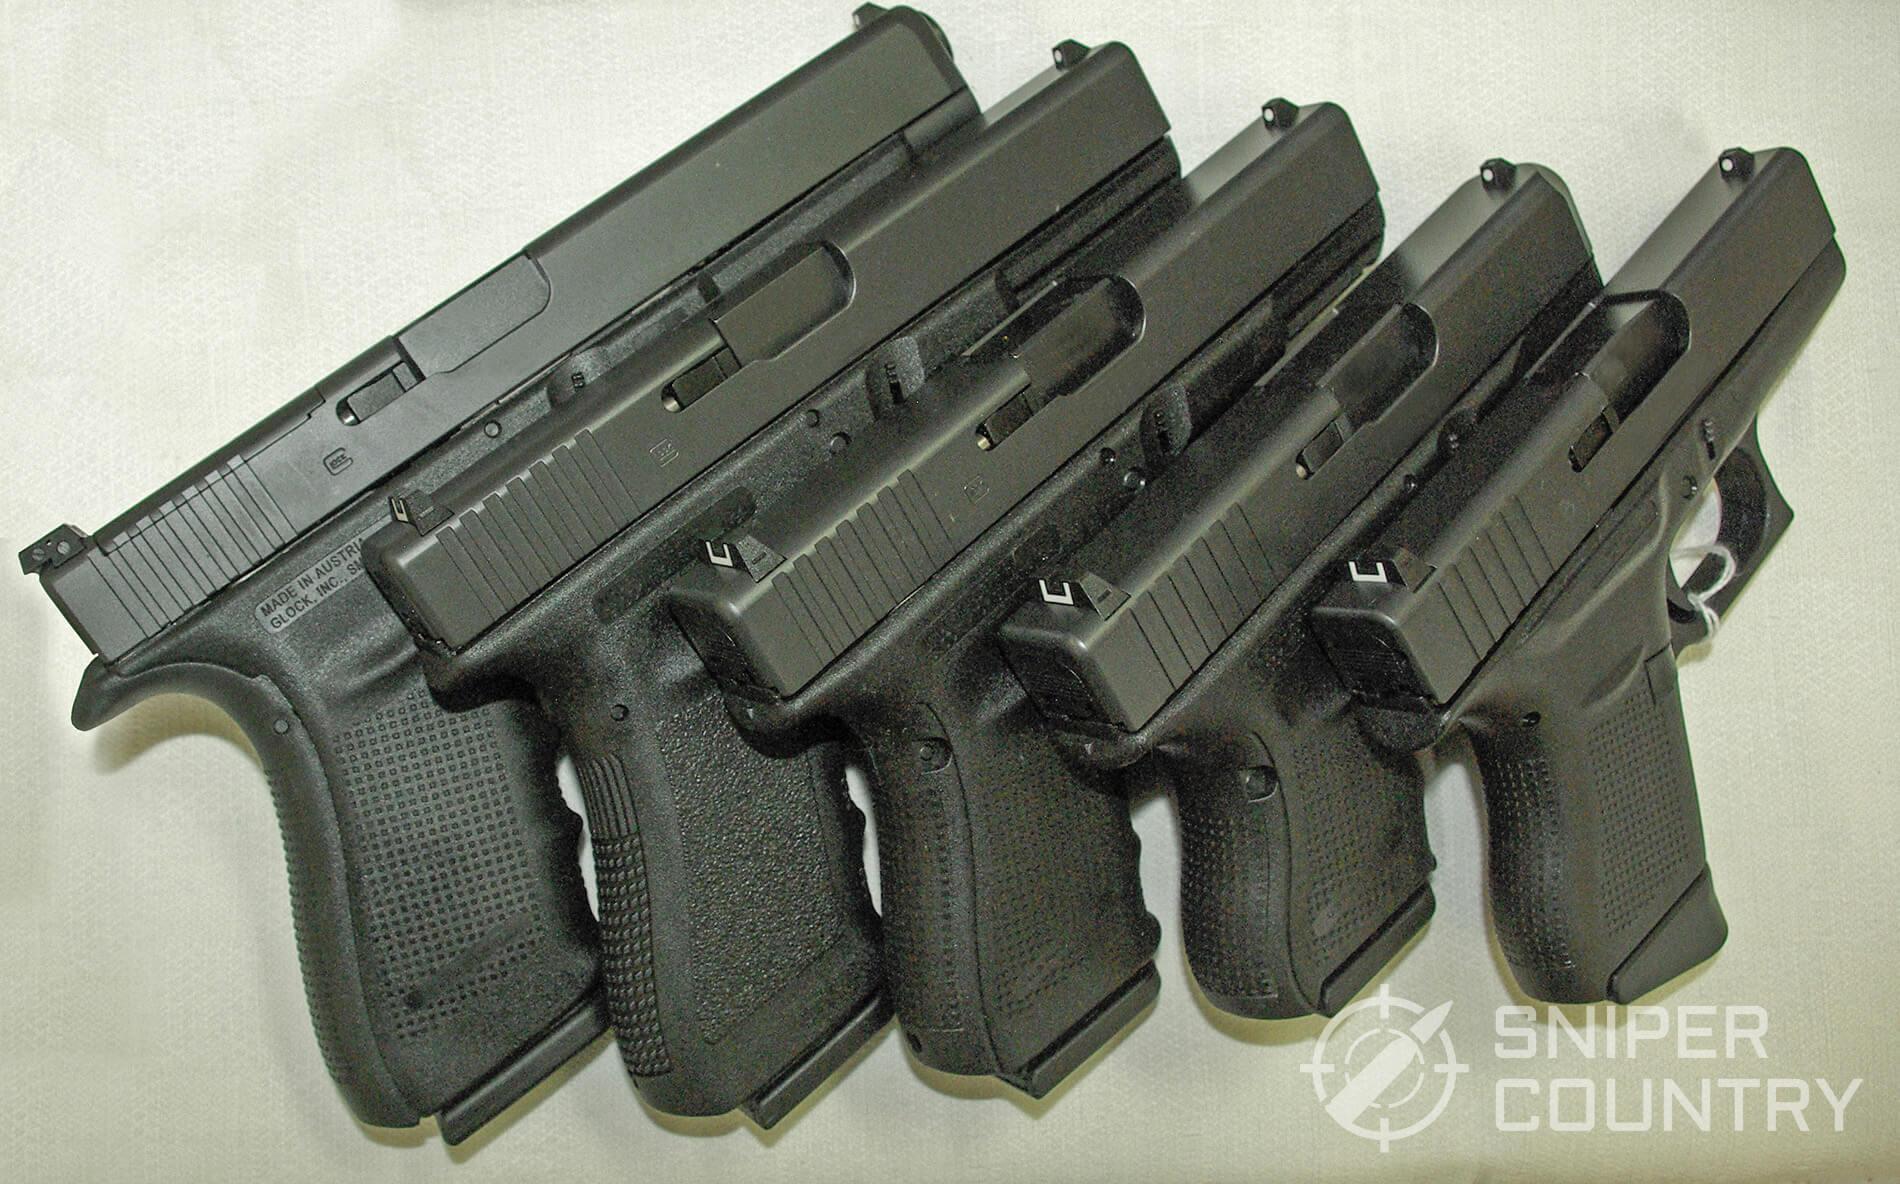 Glock 17 vs Glock 19 vs Glock 26 vs Glock 41 vs Glock 43 WM